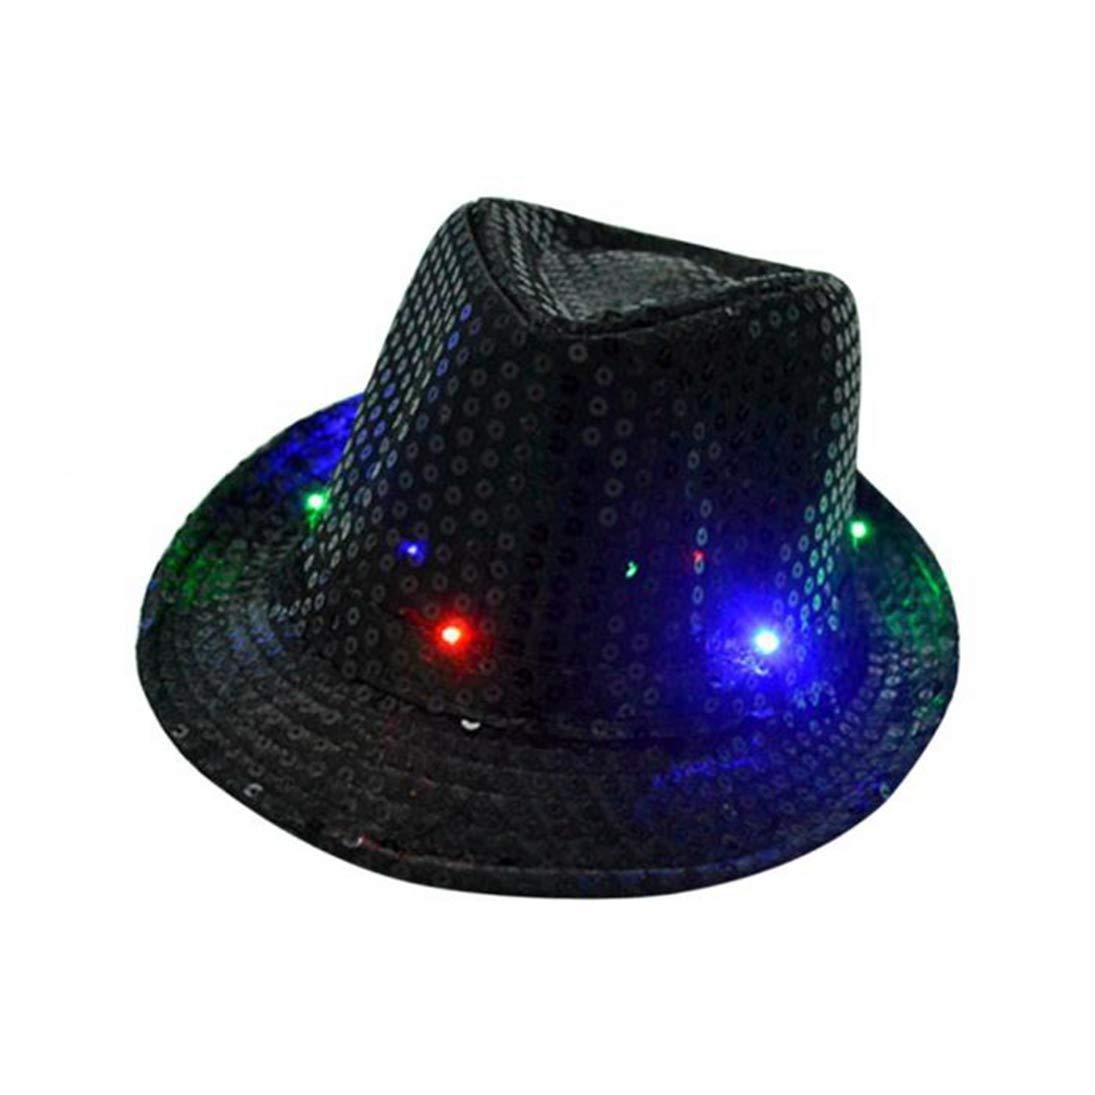 ASO-SLING Sequined Fedora Hat Unisex Men Women Short Brim Dance Jazz Hats Lightweight Masquerade Party Hat